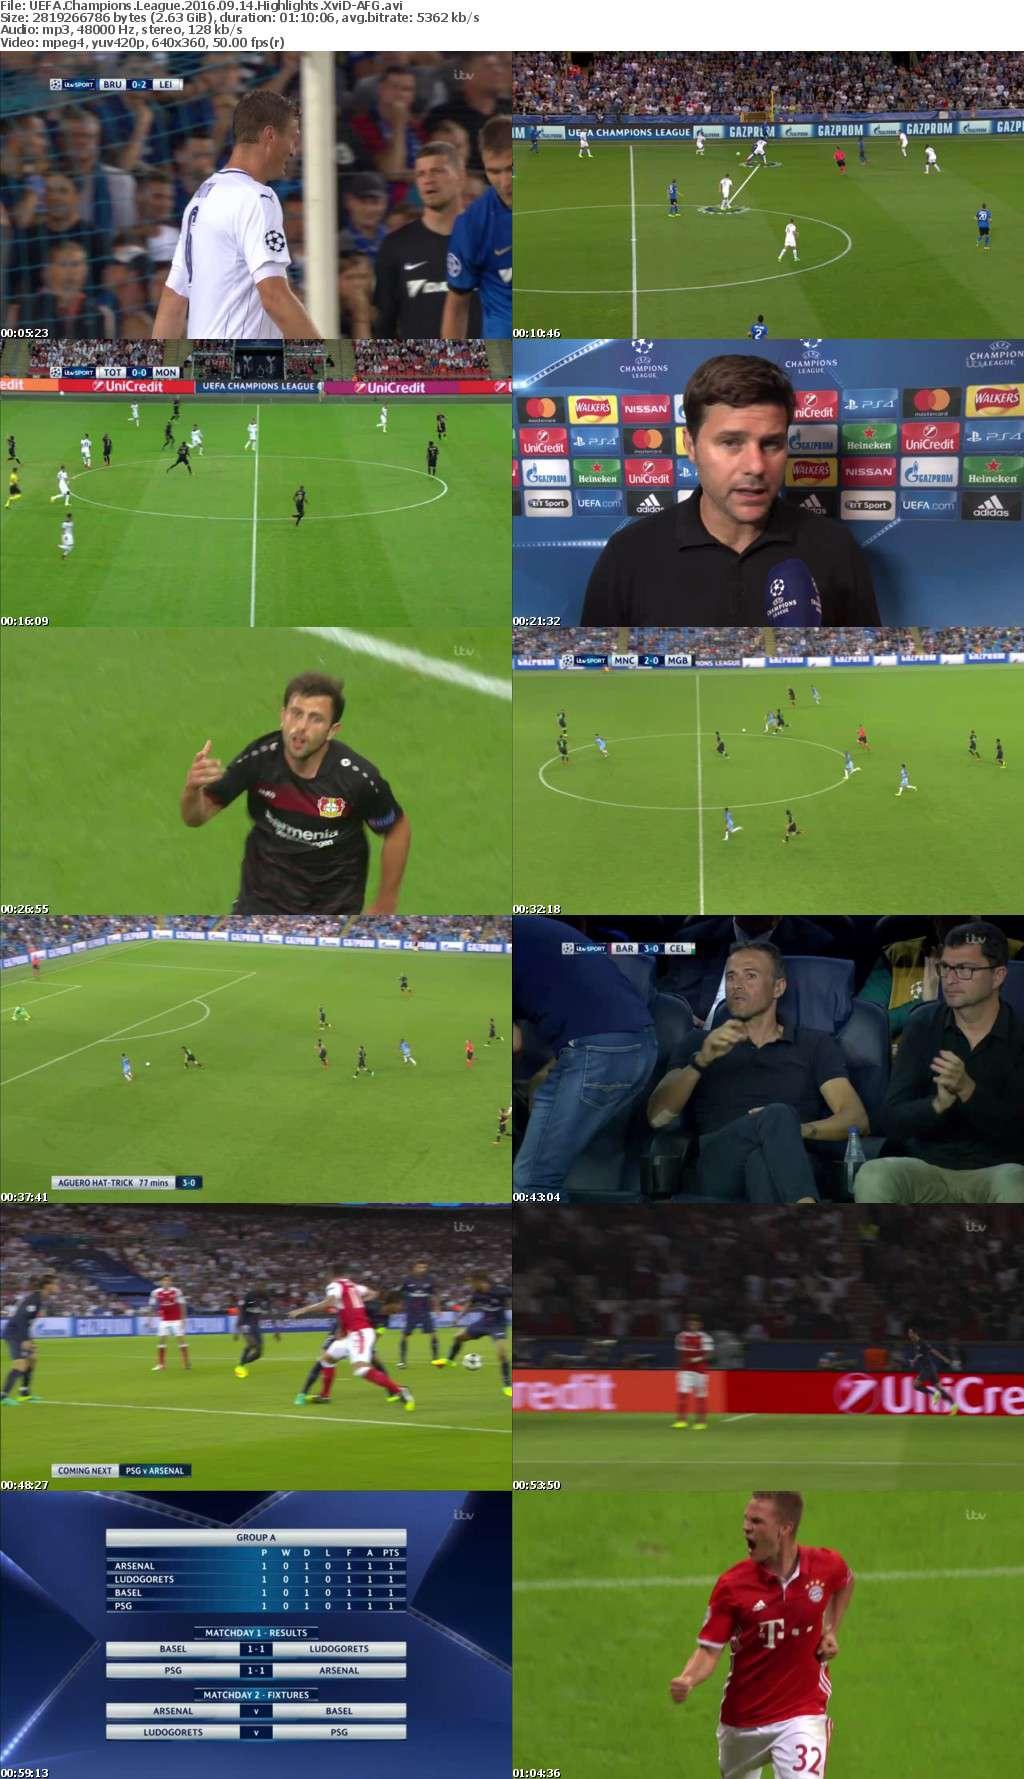 UEFA Champions League 2016 09 14 Highlights XviD-AFG